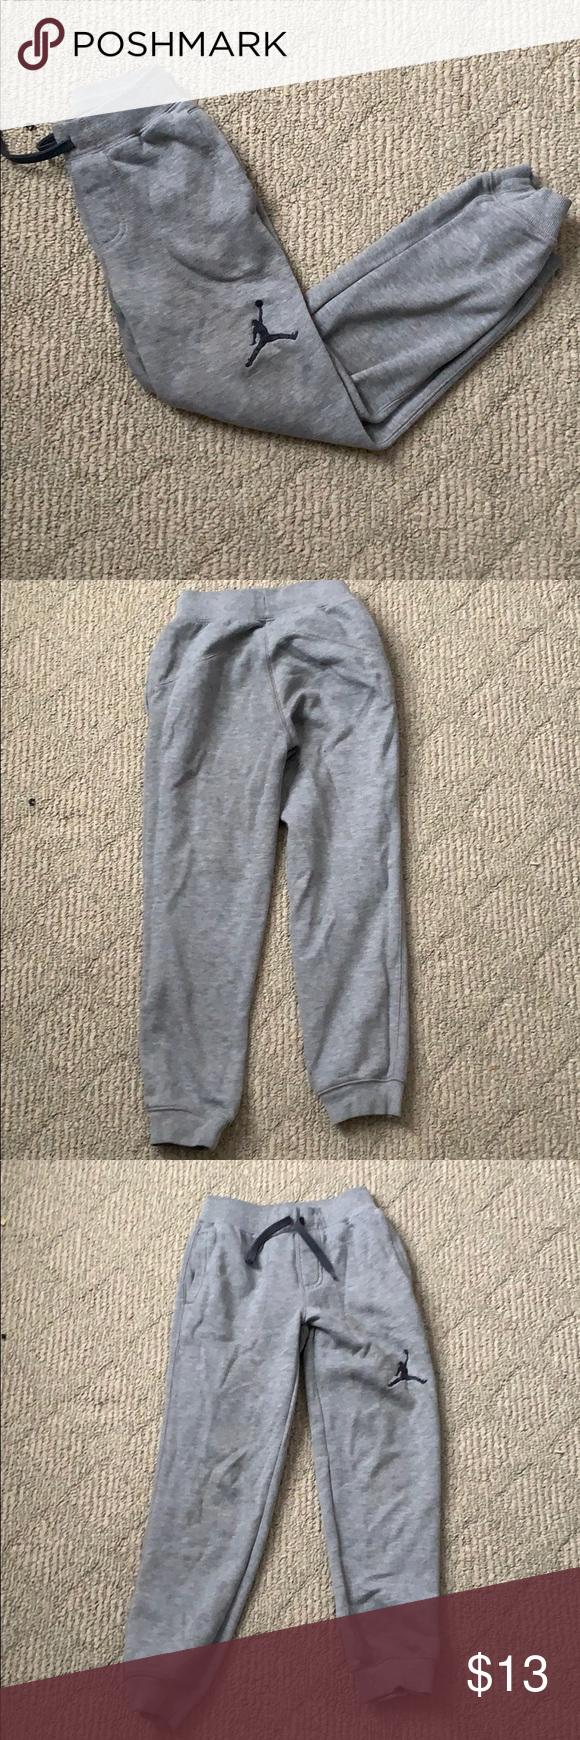 7b5afd81e2ddc5 Boys Jordan joggers Gently used grey joggers from Jordan. Size S. Jordan s  embroidered logo on one leg. Drawstring waistline. 2 pockets . No trades!